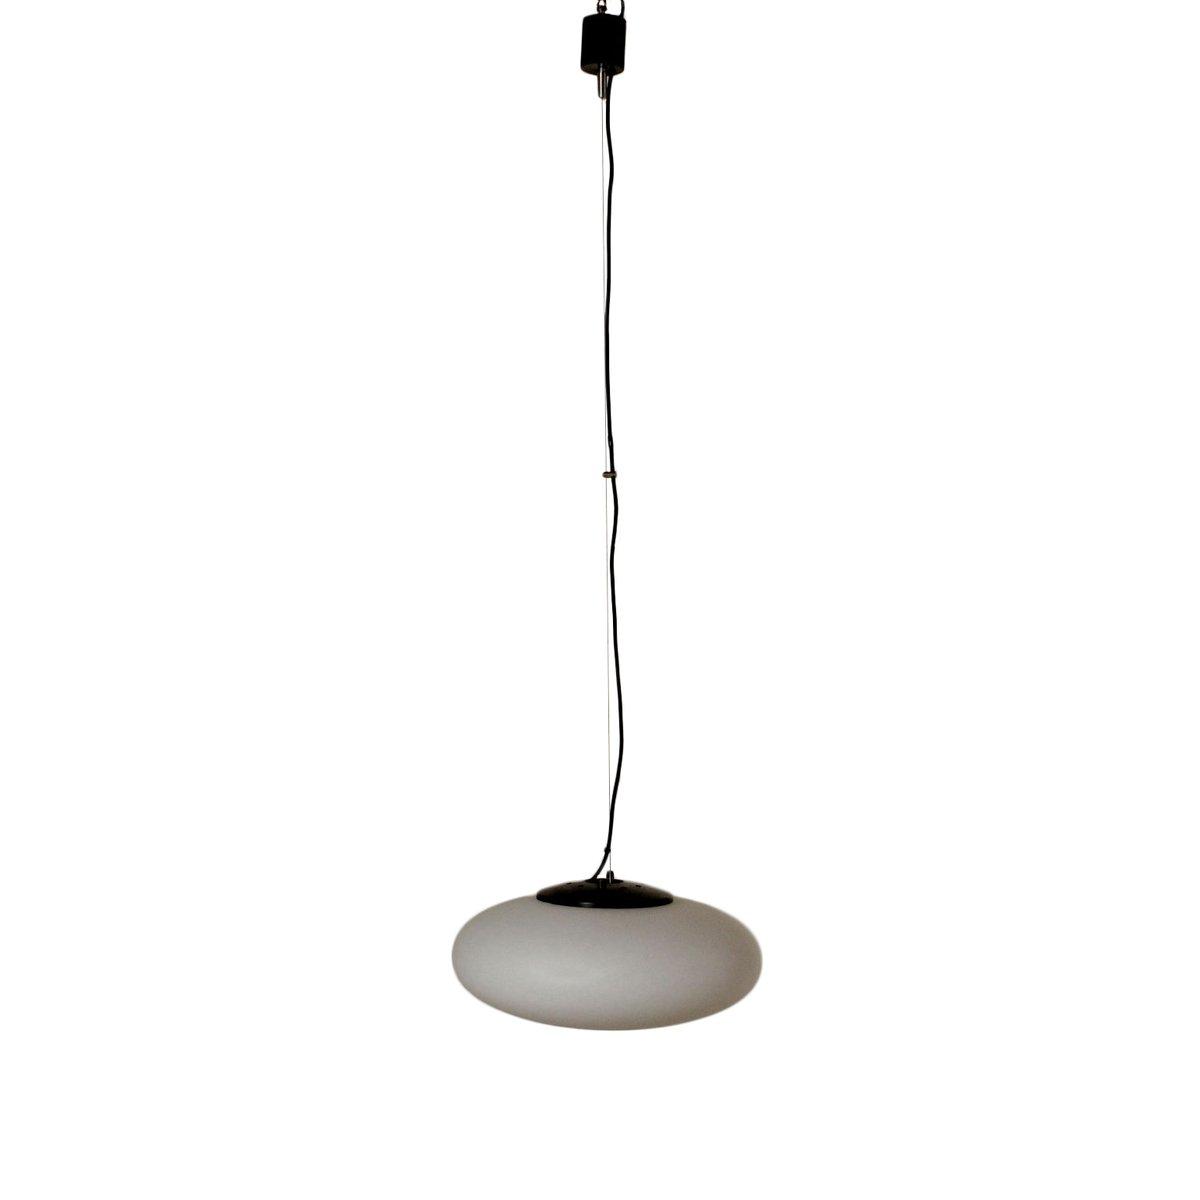 Italienische Opalglas & Metall Deckenlampe, 1960er